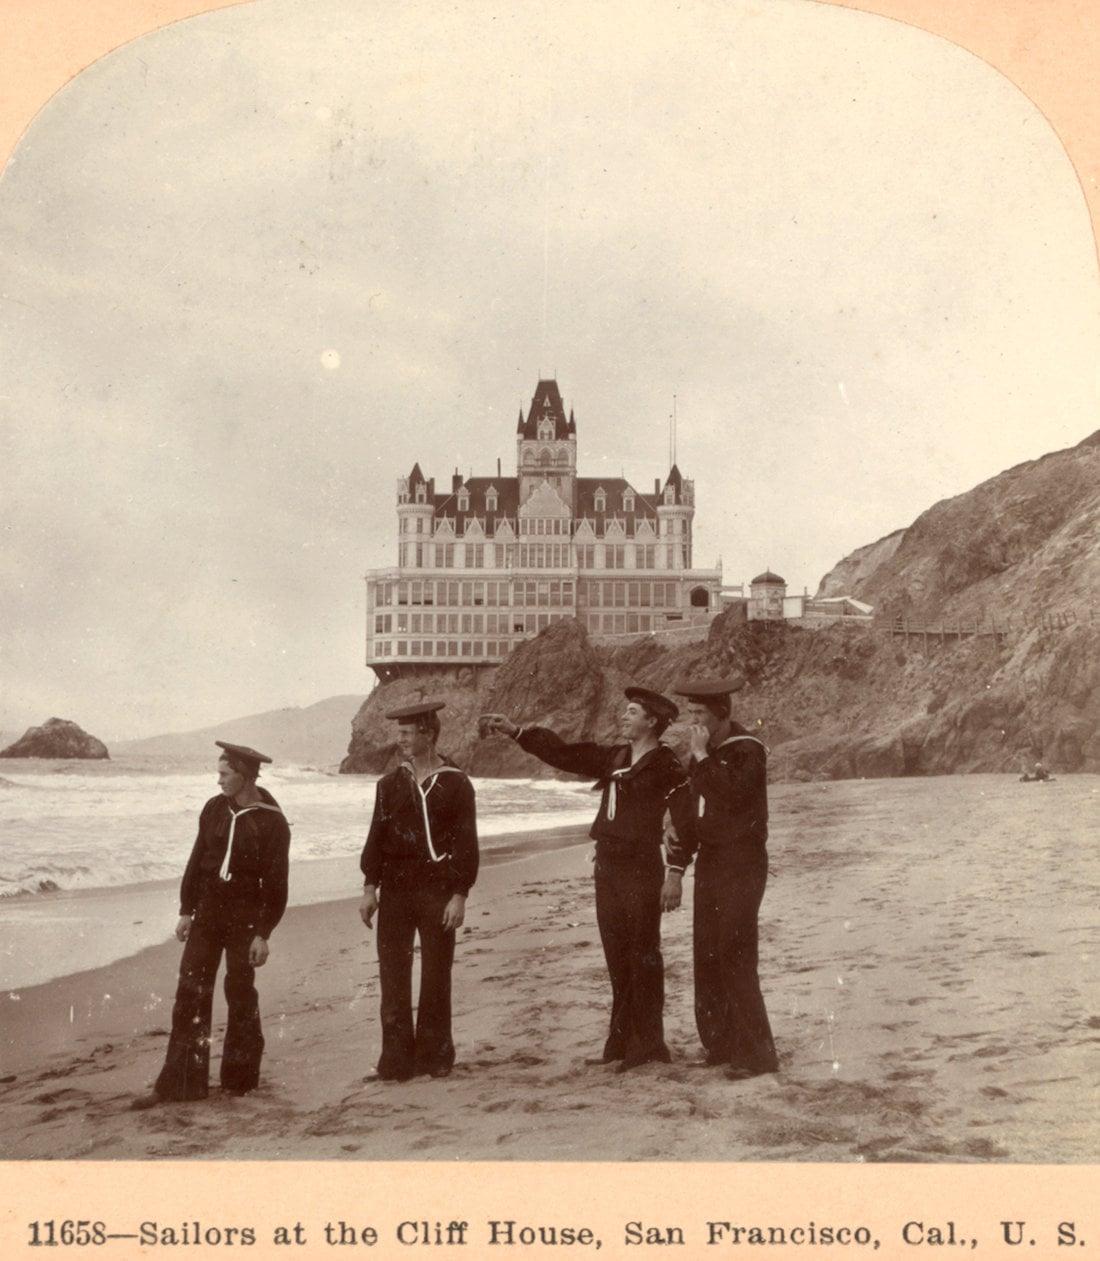 Sailors at the beach by SF Cliff House (1901)